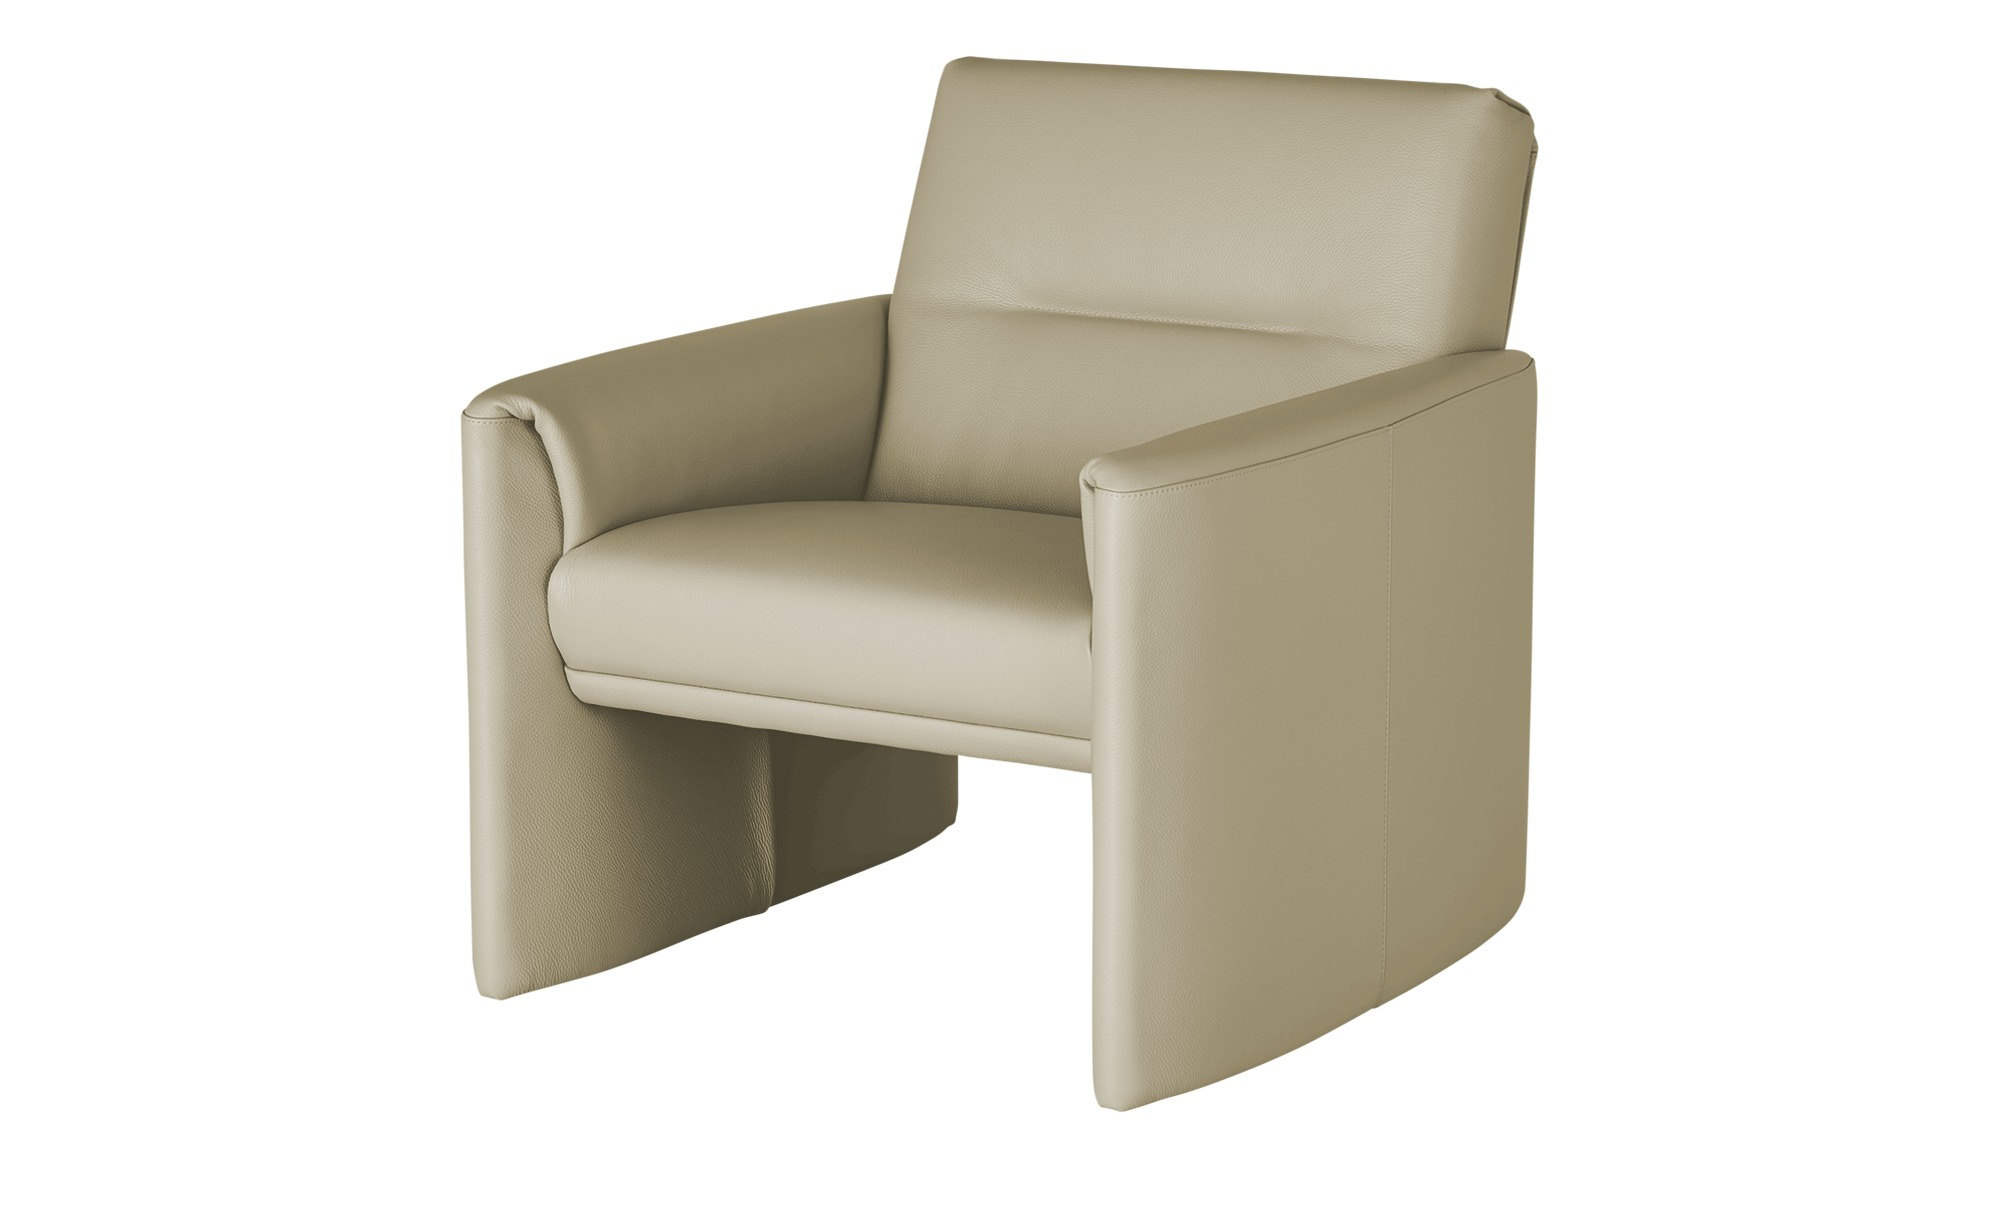 Ledersessel, hoch  Boavista ¦ creme ¦ Maße (cm): B: 83 H: 83 T: 89 Polstermöbel > Sessel > Ledersessel - Höffner